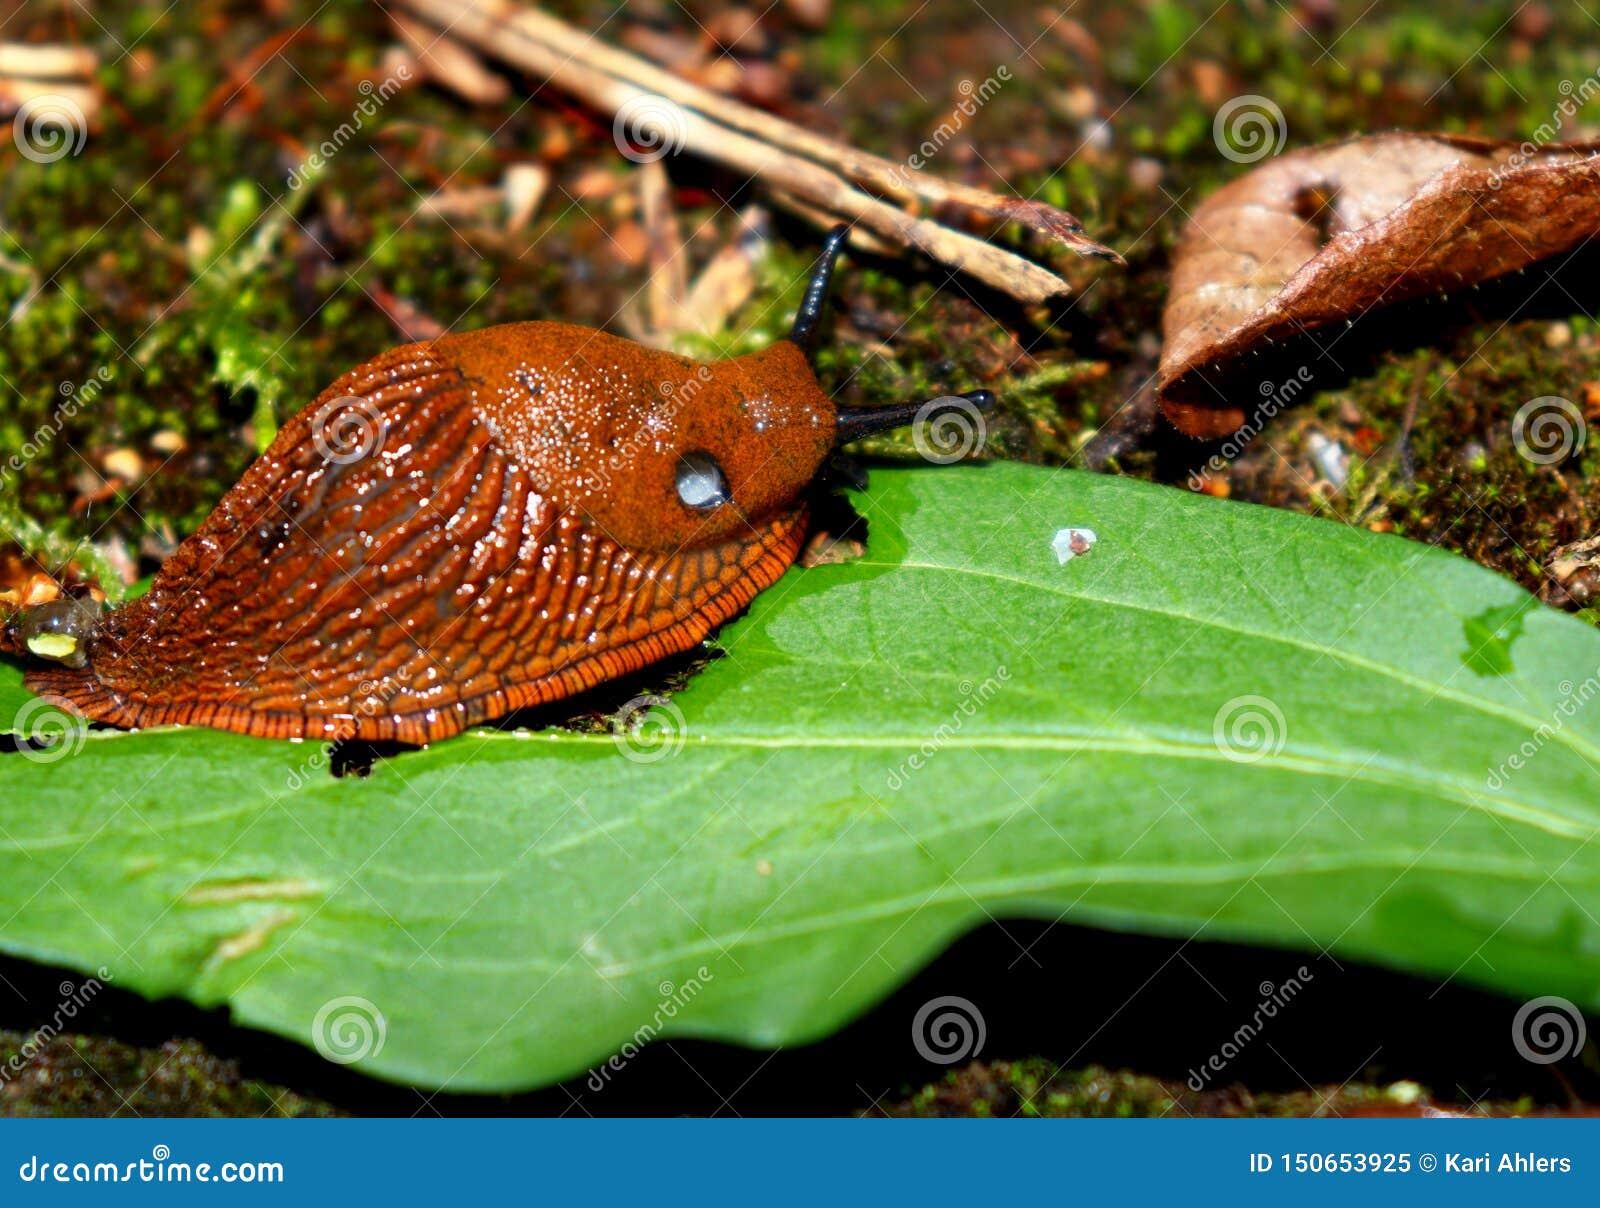 Giant, slimy slug eating a leaf